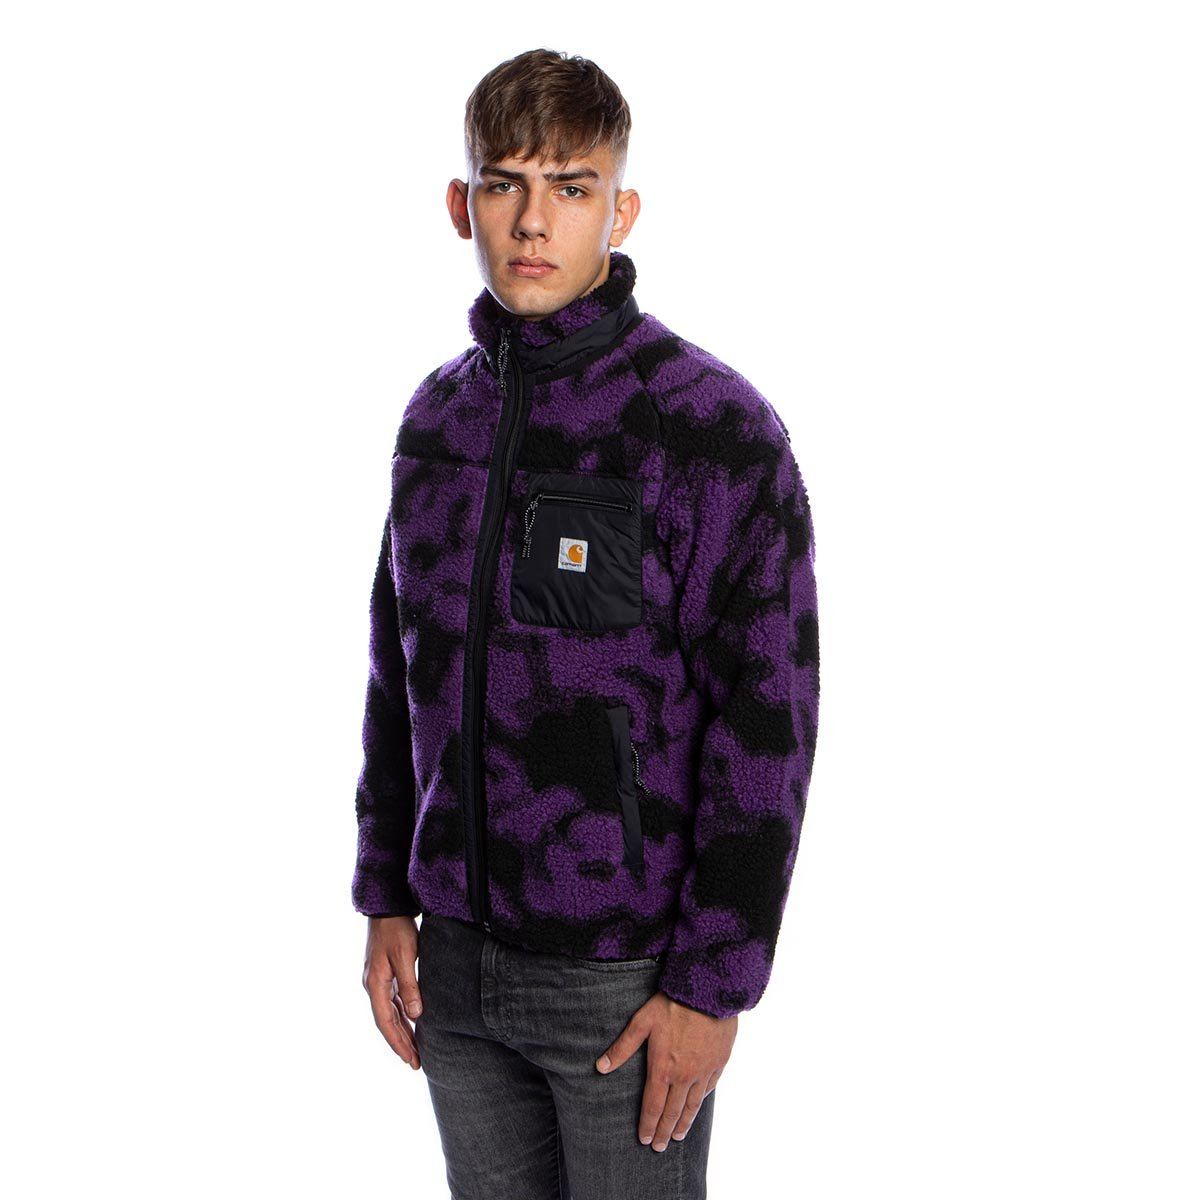 Carhartt WIP Prentis liner camo Blur Purple Taille S-XXL Veste Teddy